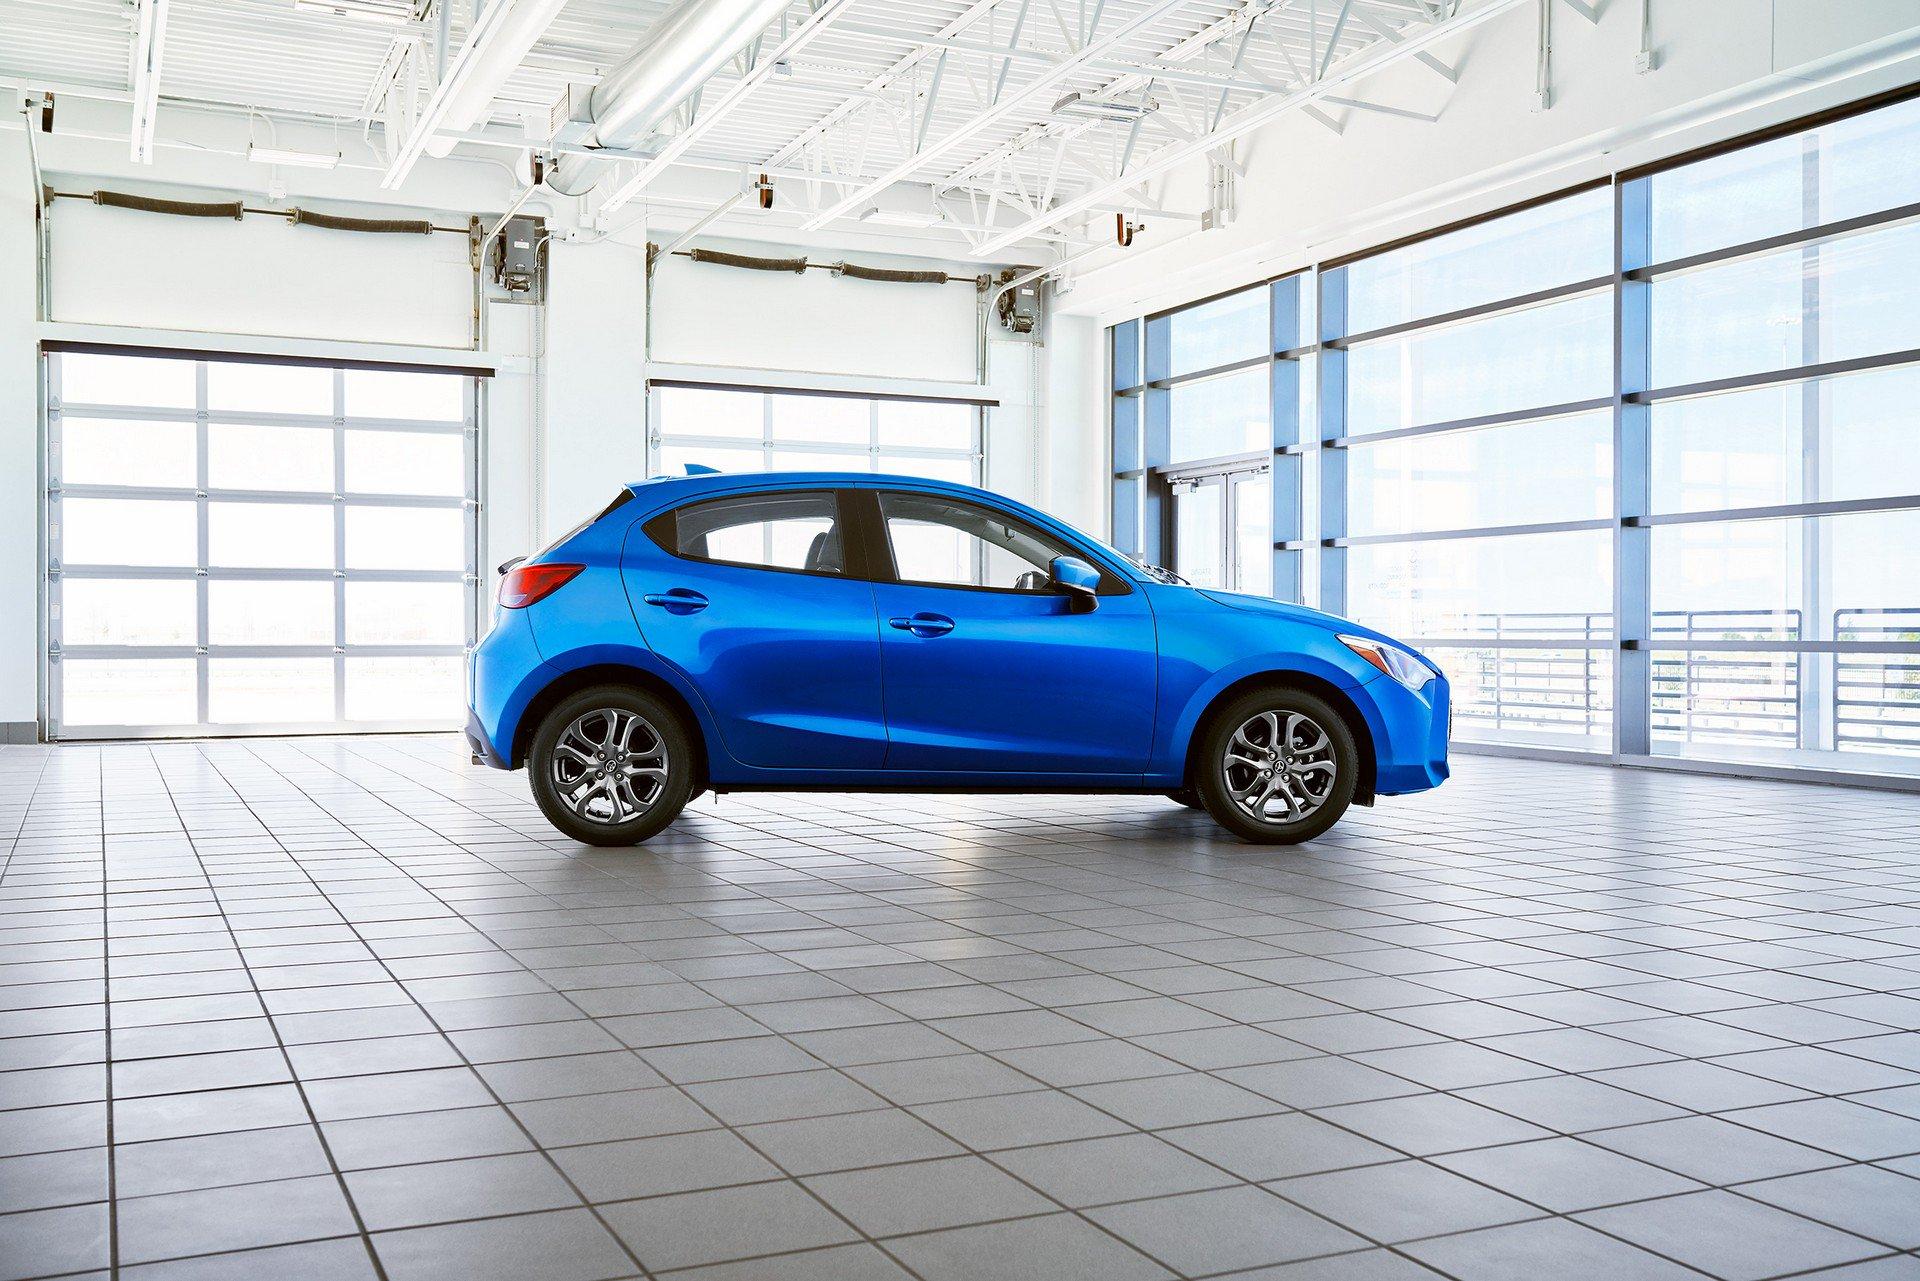 Toyota-Yaris-Hatchback-2020-3